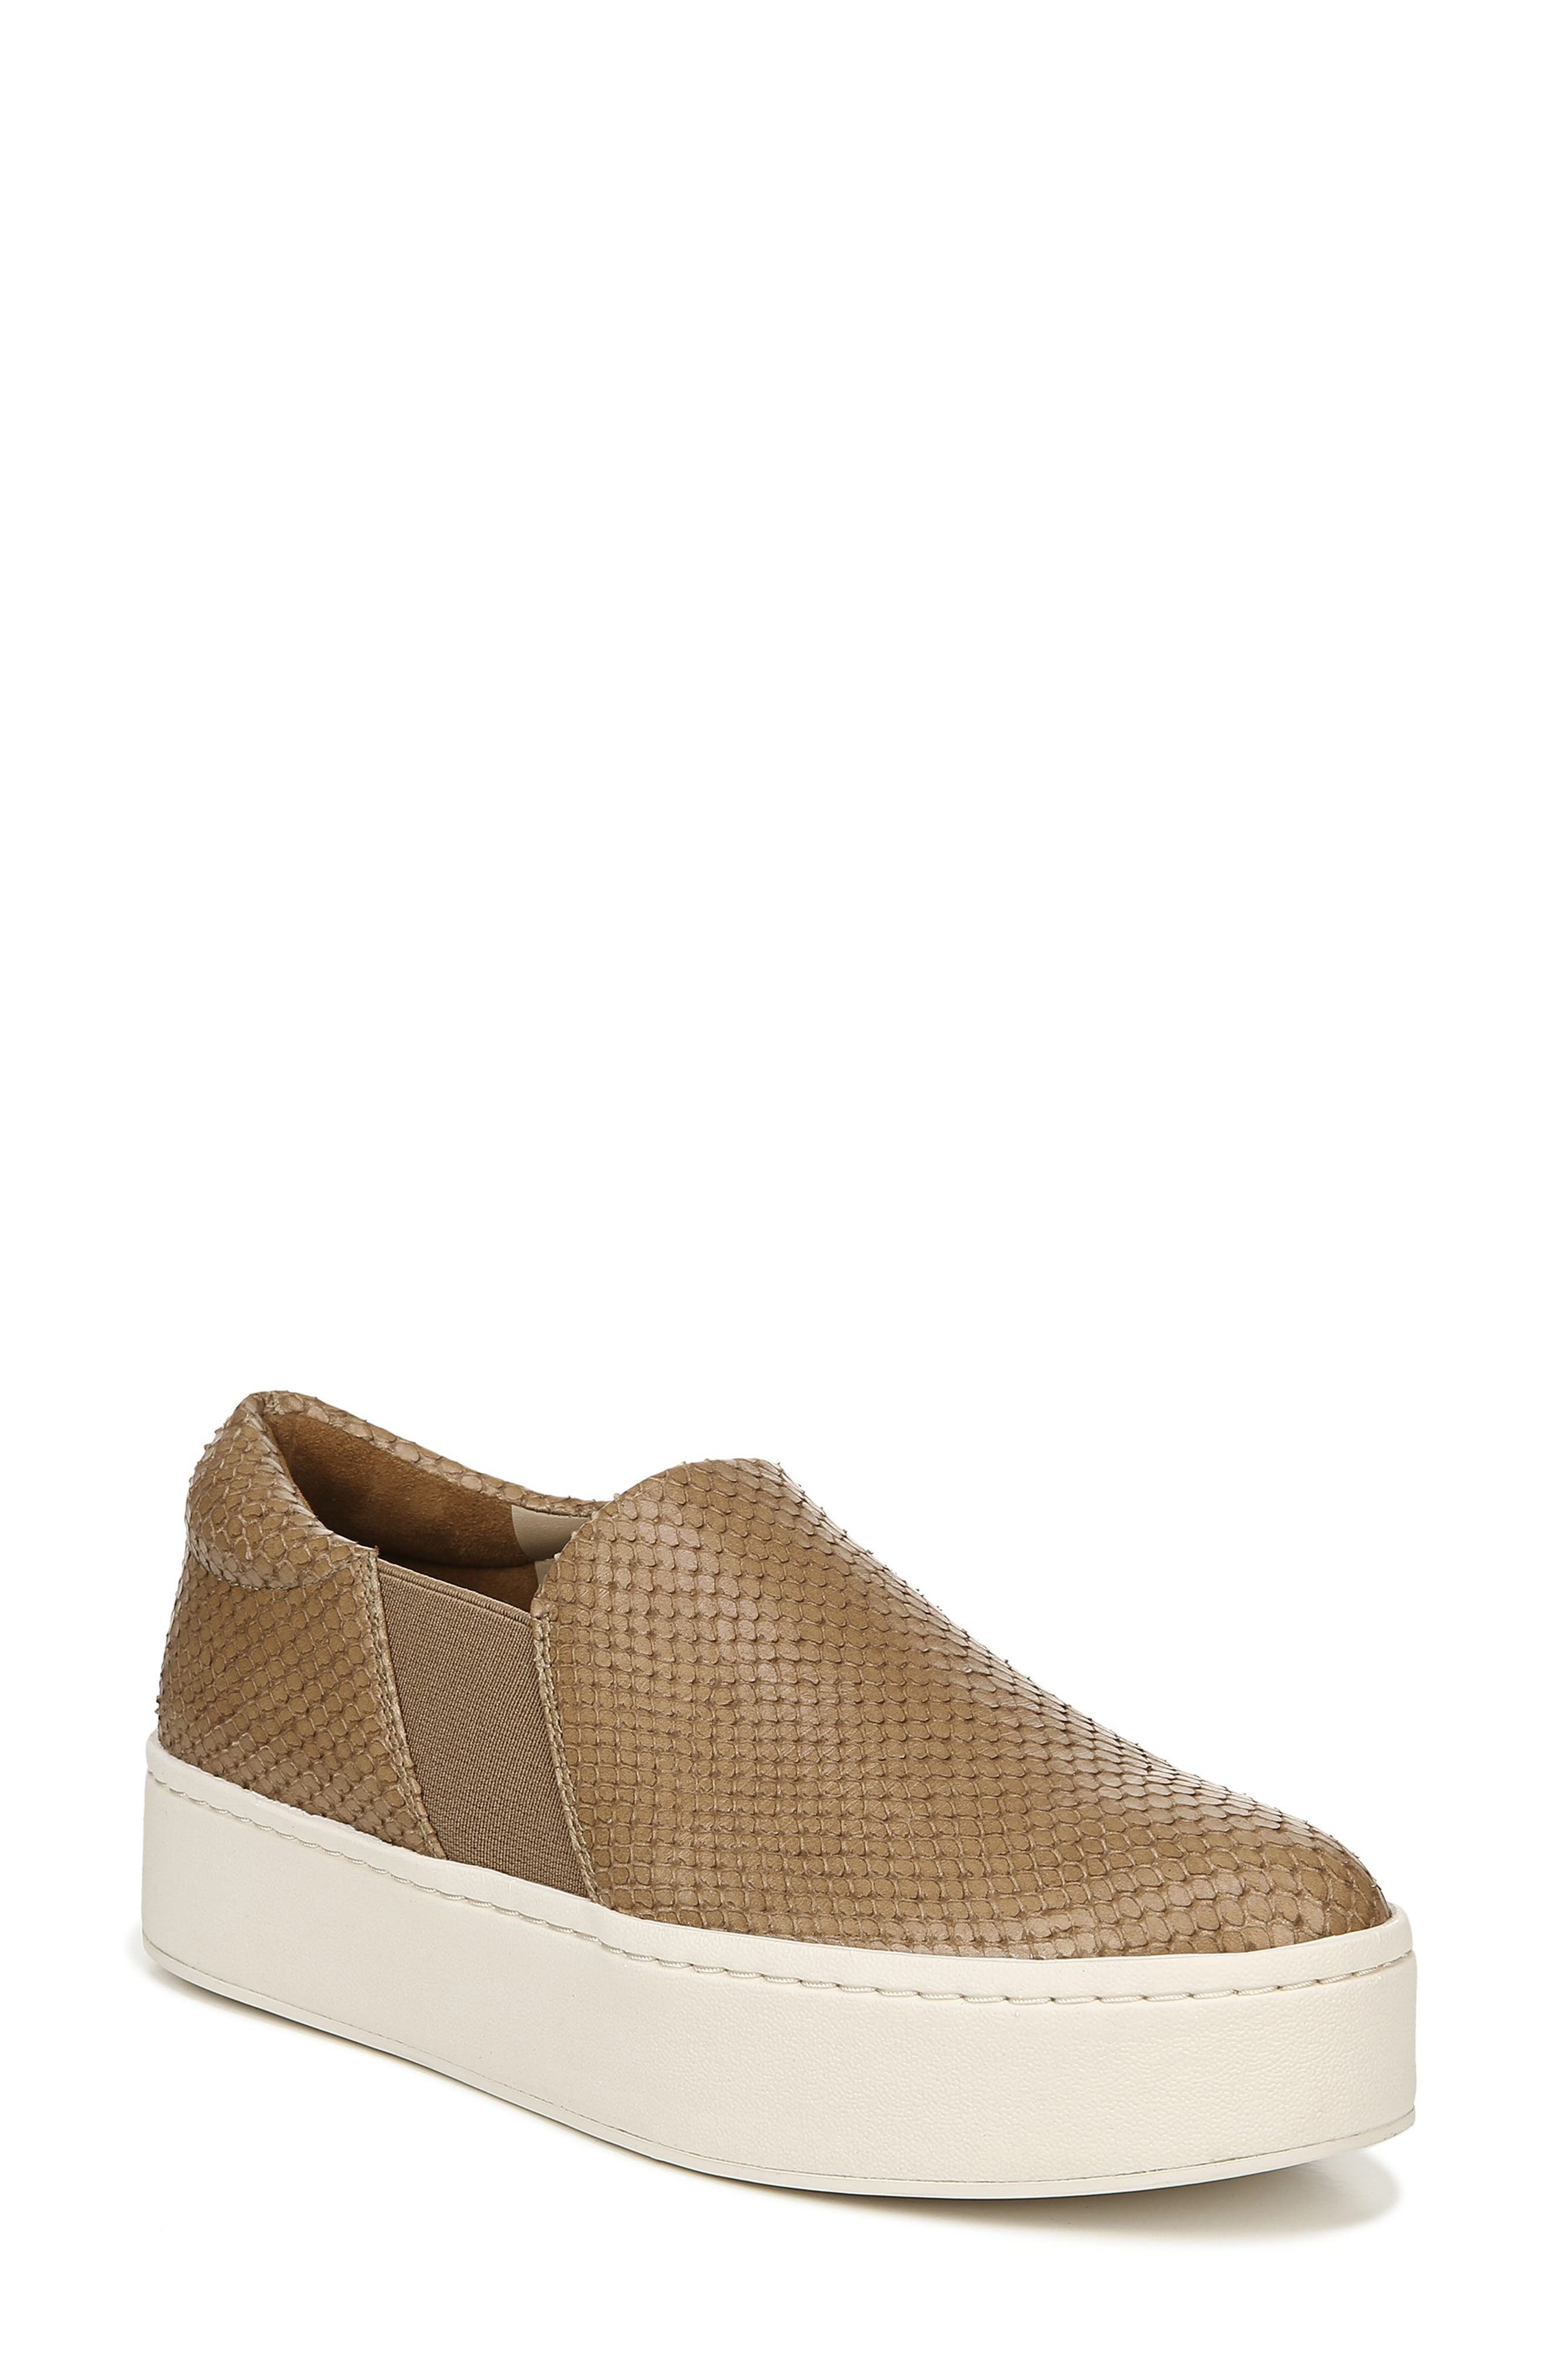 Women's Vince Shoes | Nordstrom